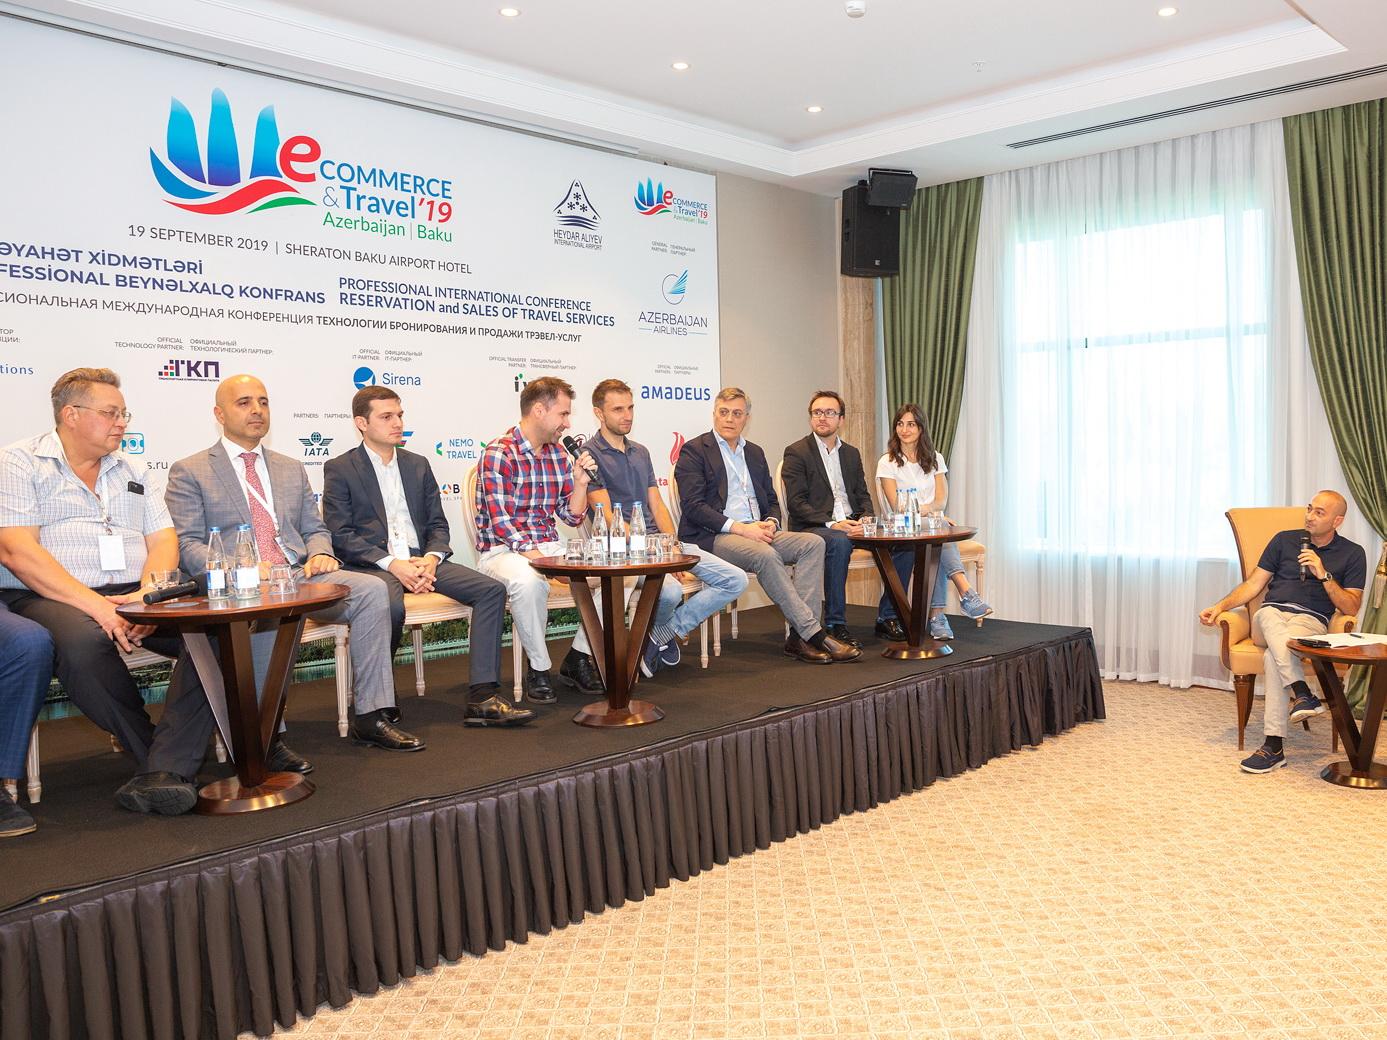 При поддержке AZAL в Баку прошла крупная конференция e-Commerce & Travel 2019